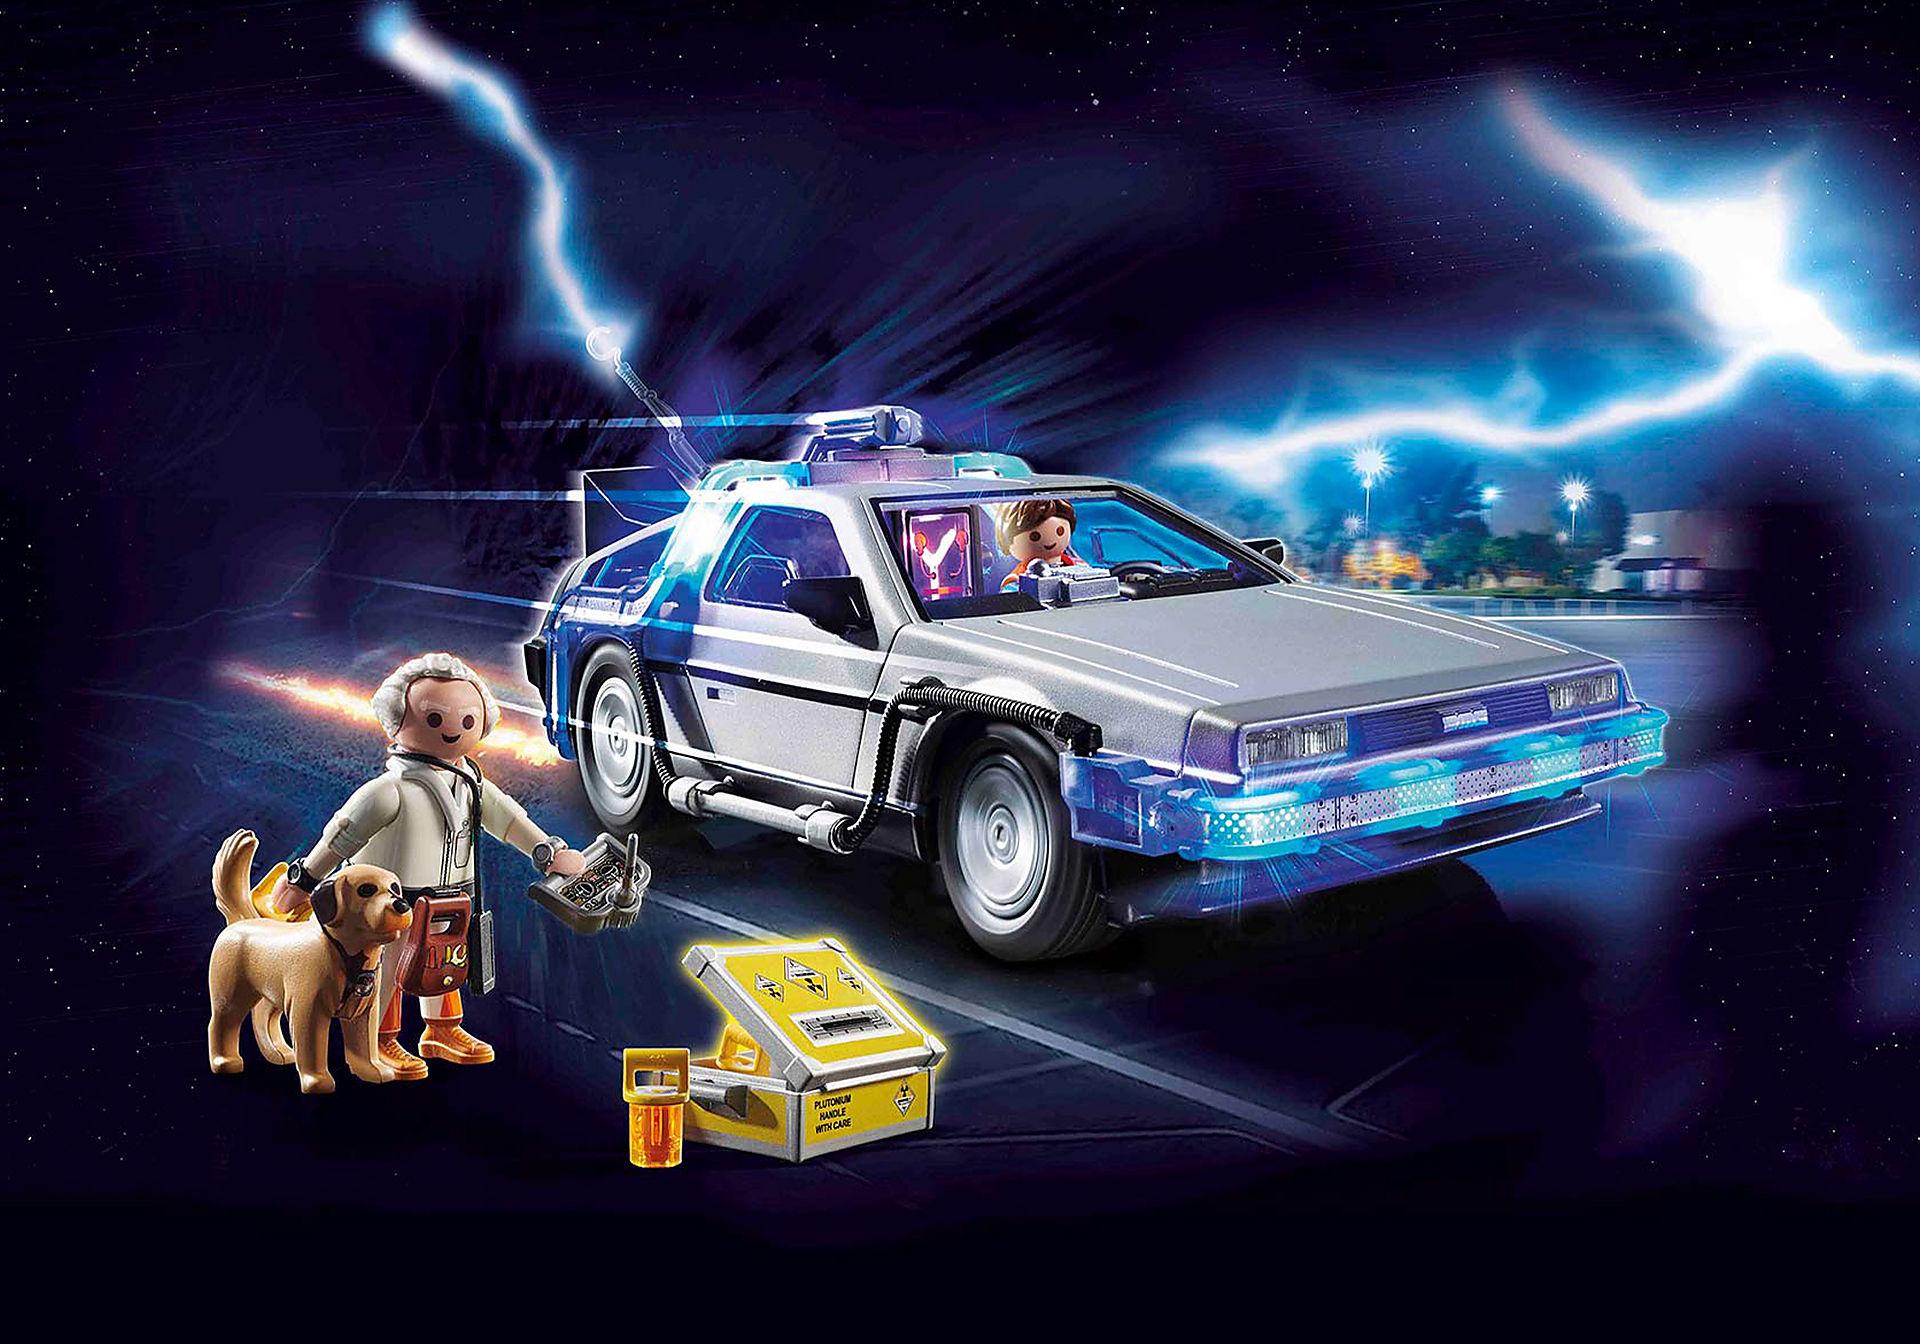 70317 Back to the Future Συλλεκτικό όχημα Ντελόριαν zoom image1